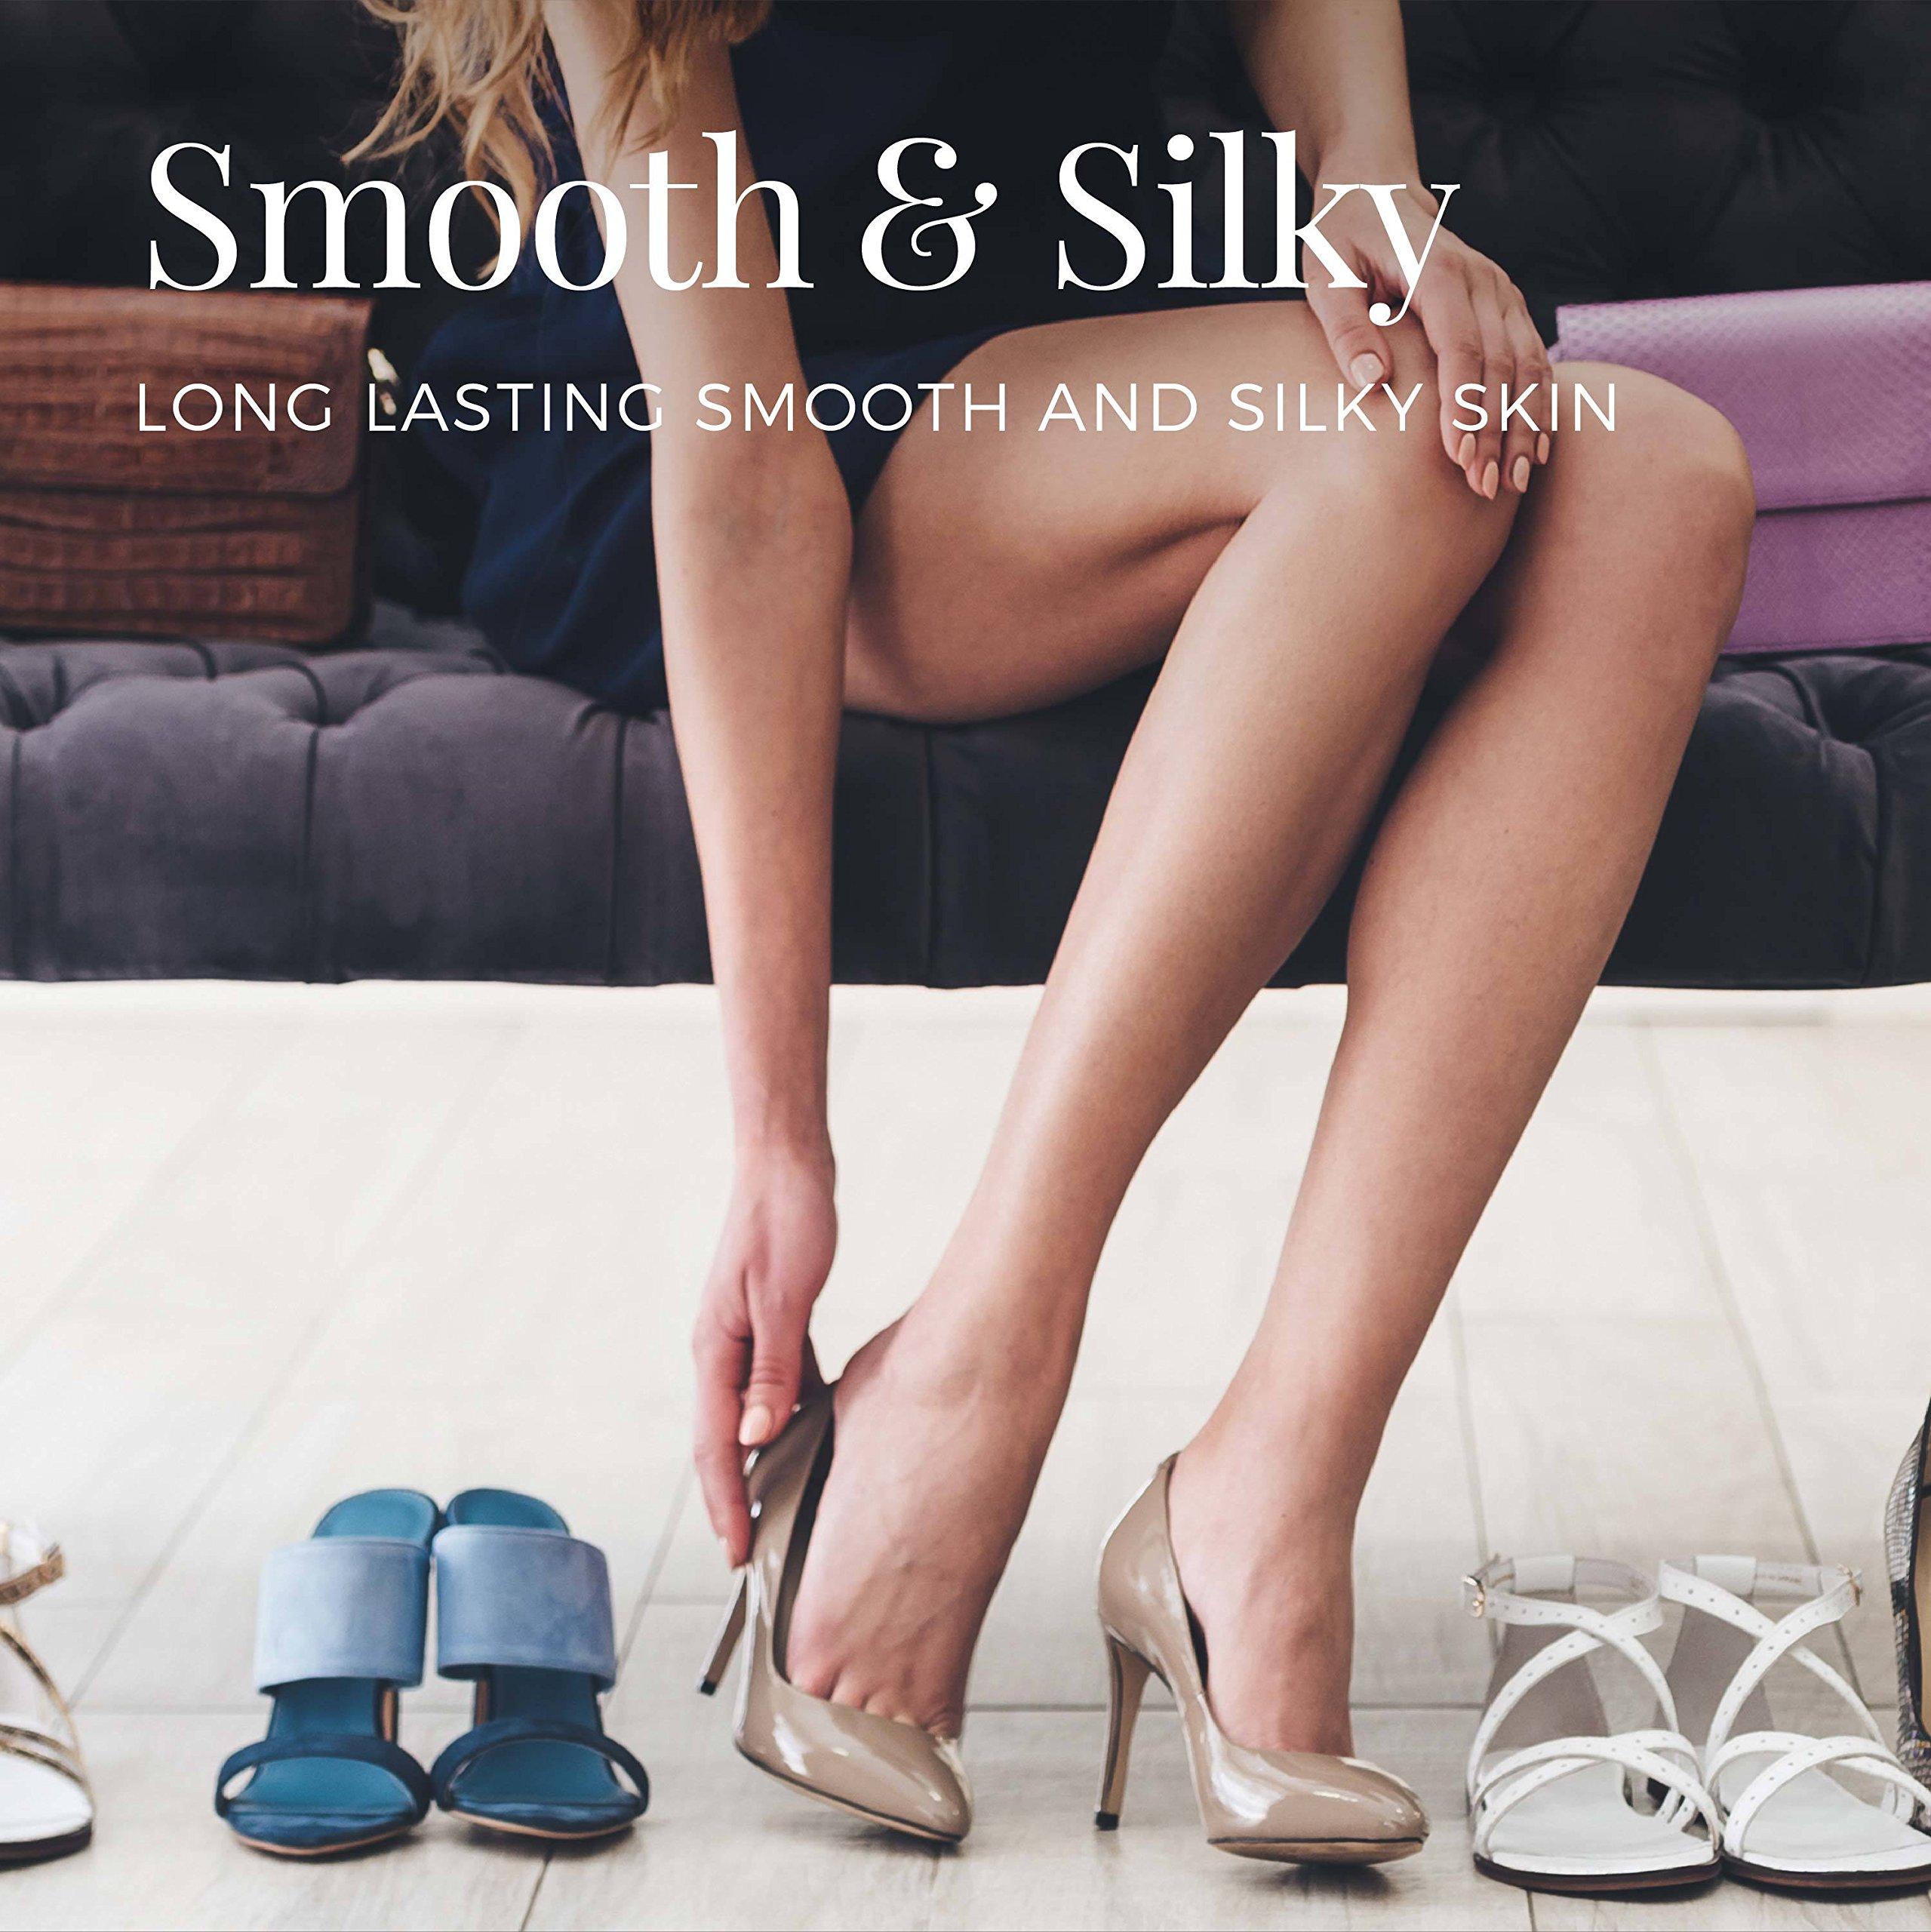 Remington Smooth & Silky Body & Bikini Kit, Pink, WPG4020C by Remington (Image #5)